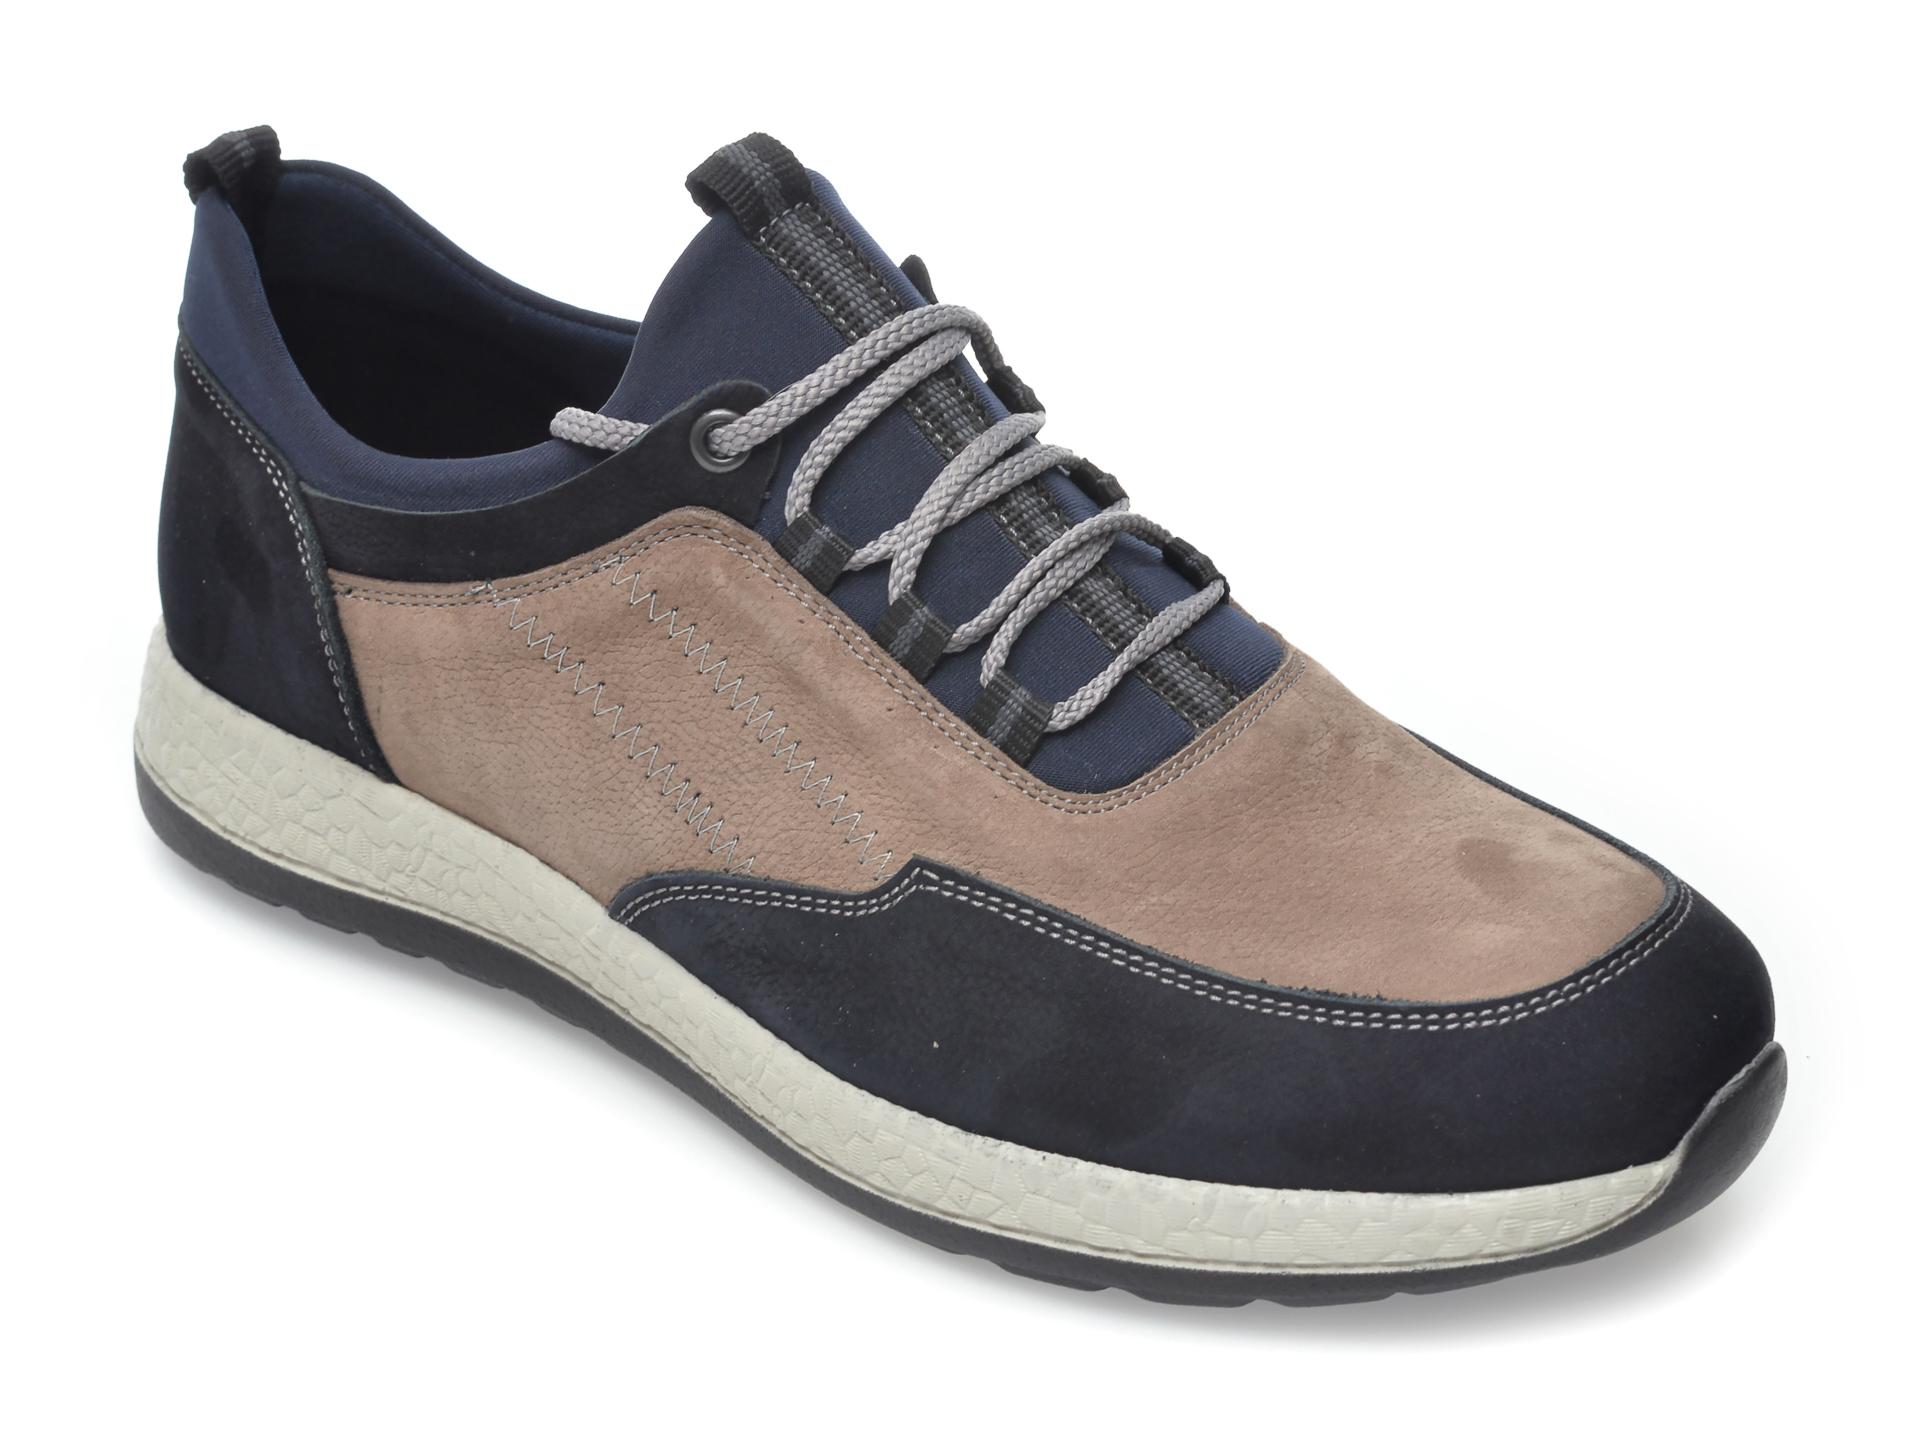 Pantofi Otter Bleumarin, 22172, Din Nabuc